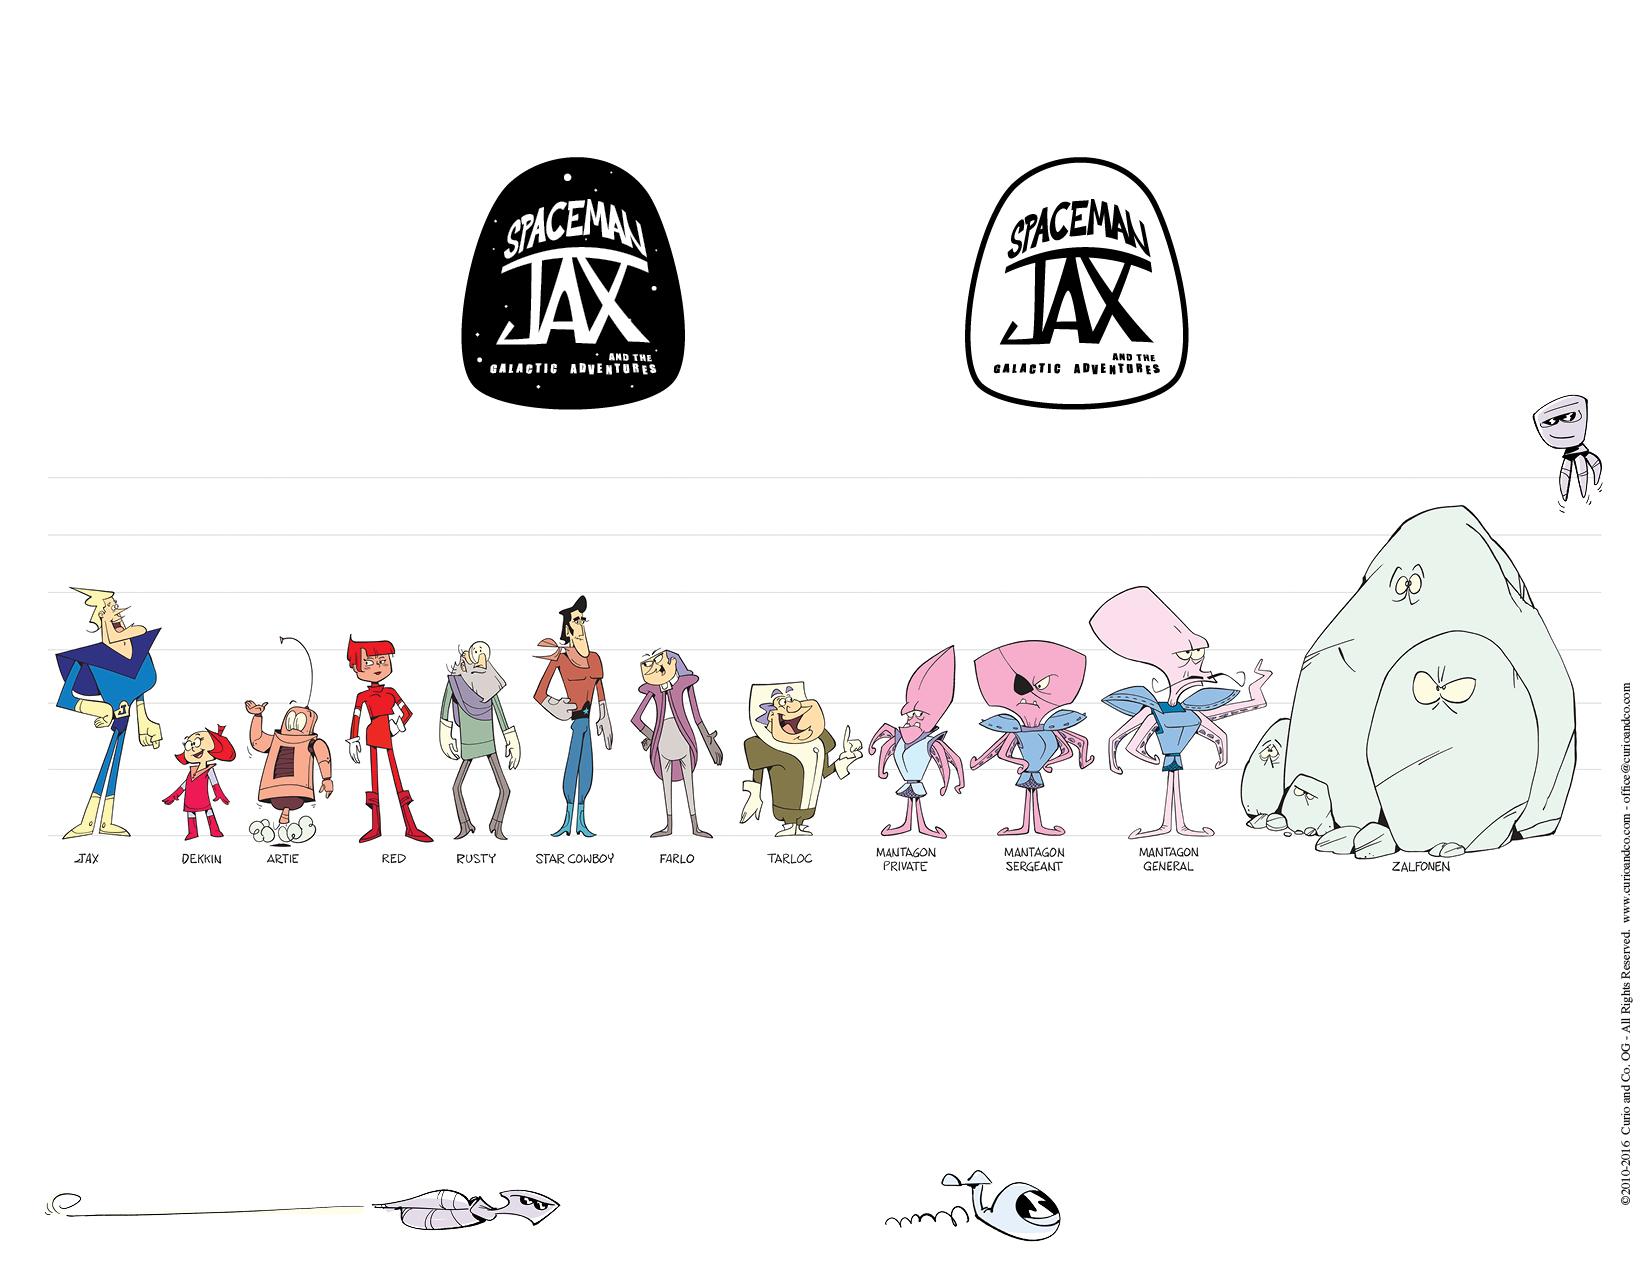 Spaceman Jax - Character Line-Up